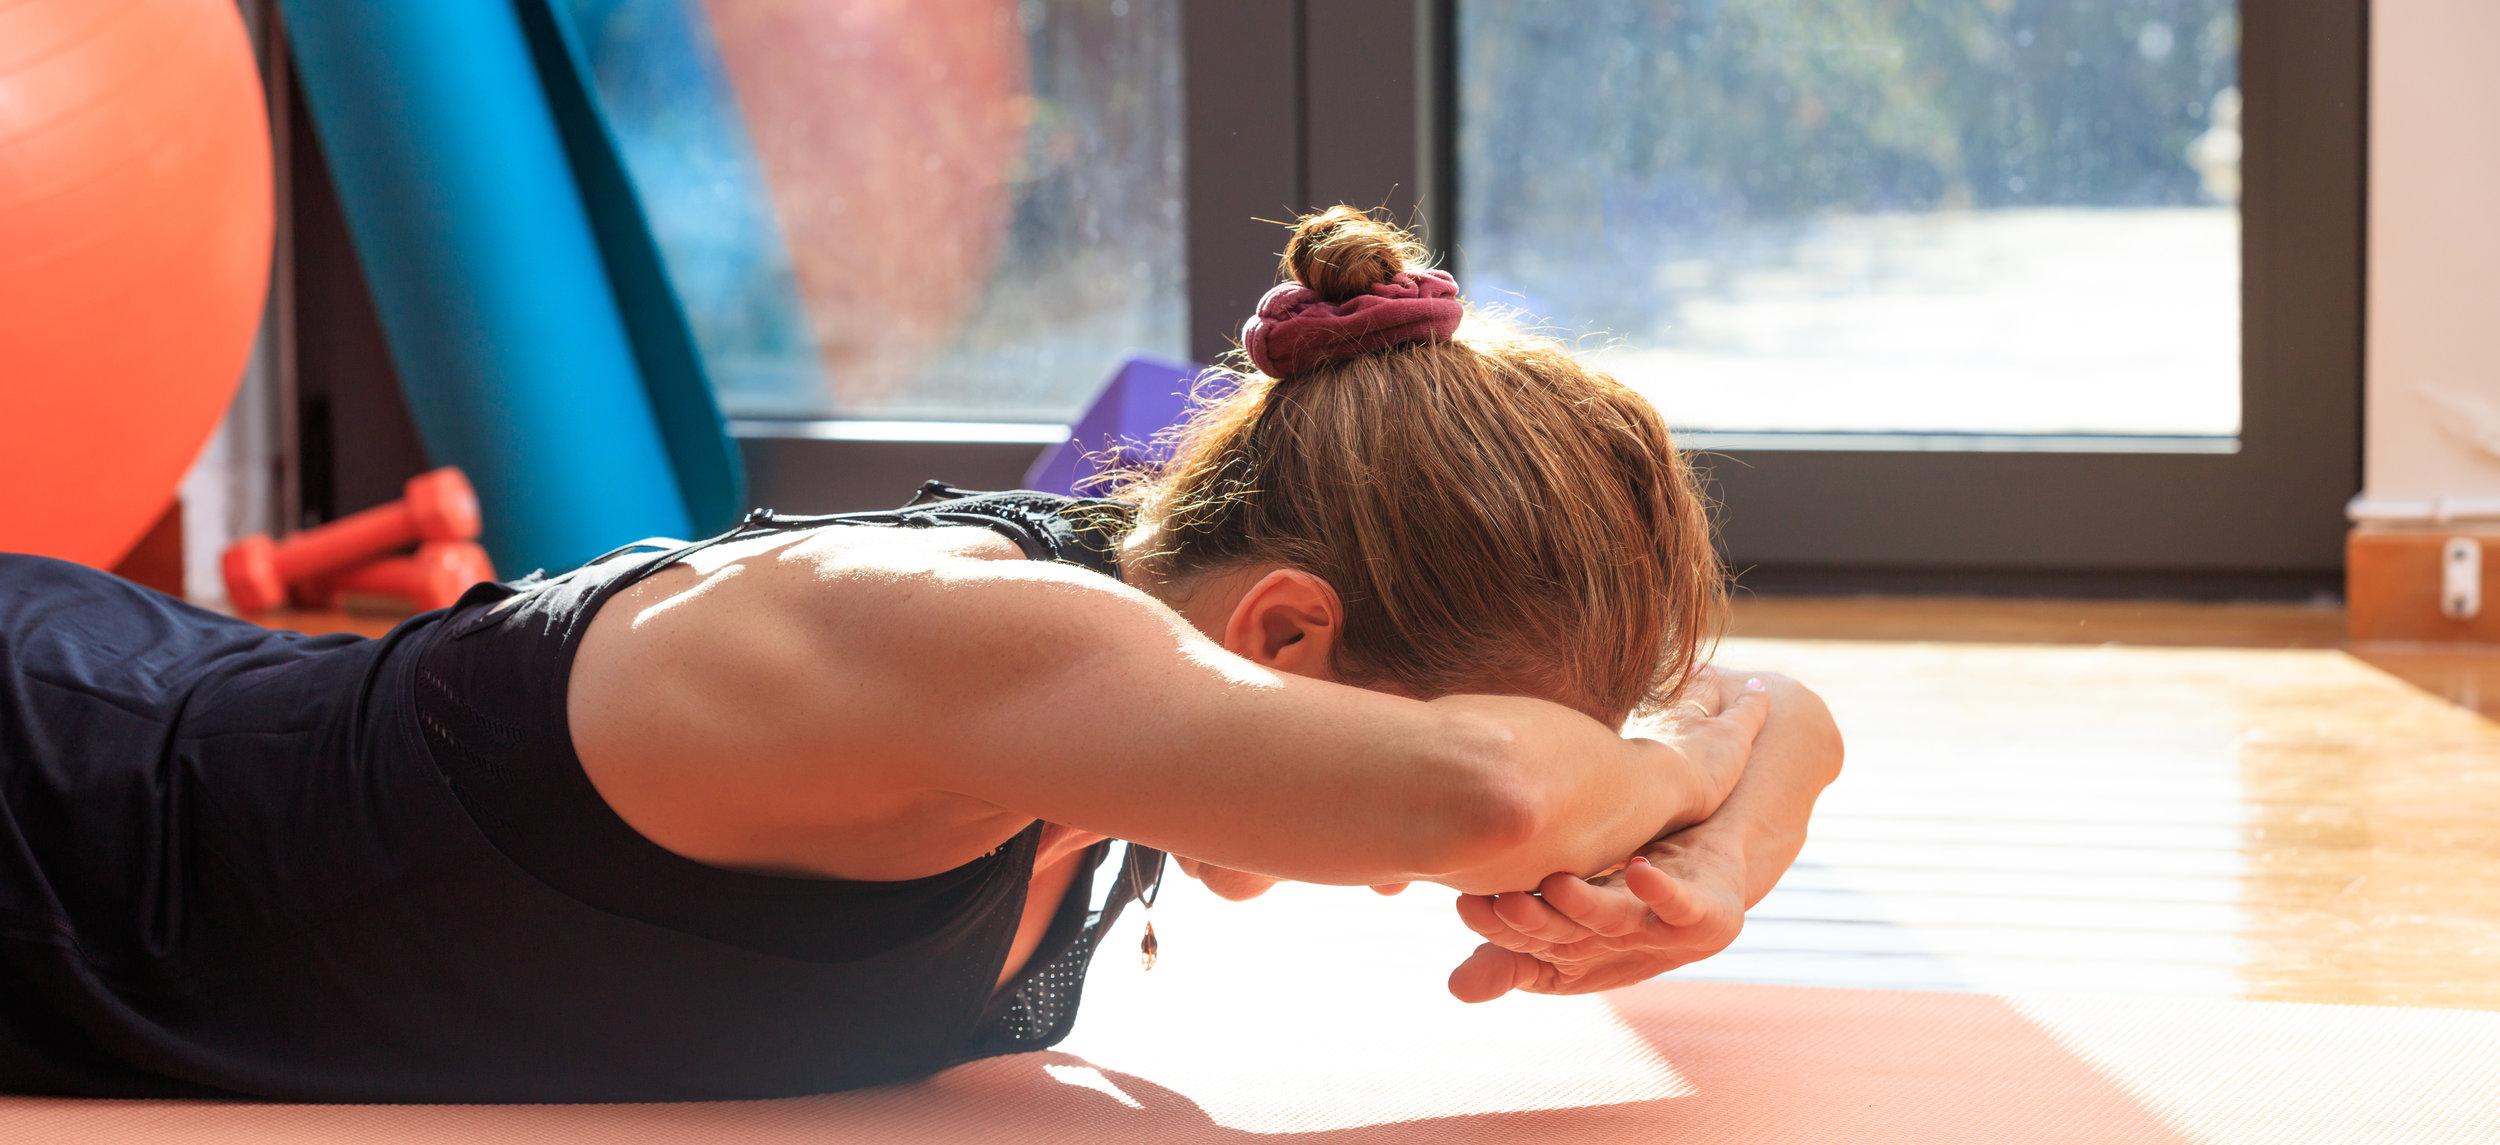 bigstock-Woman-In-A-Pilates-Class-207166444.jpg